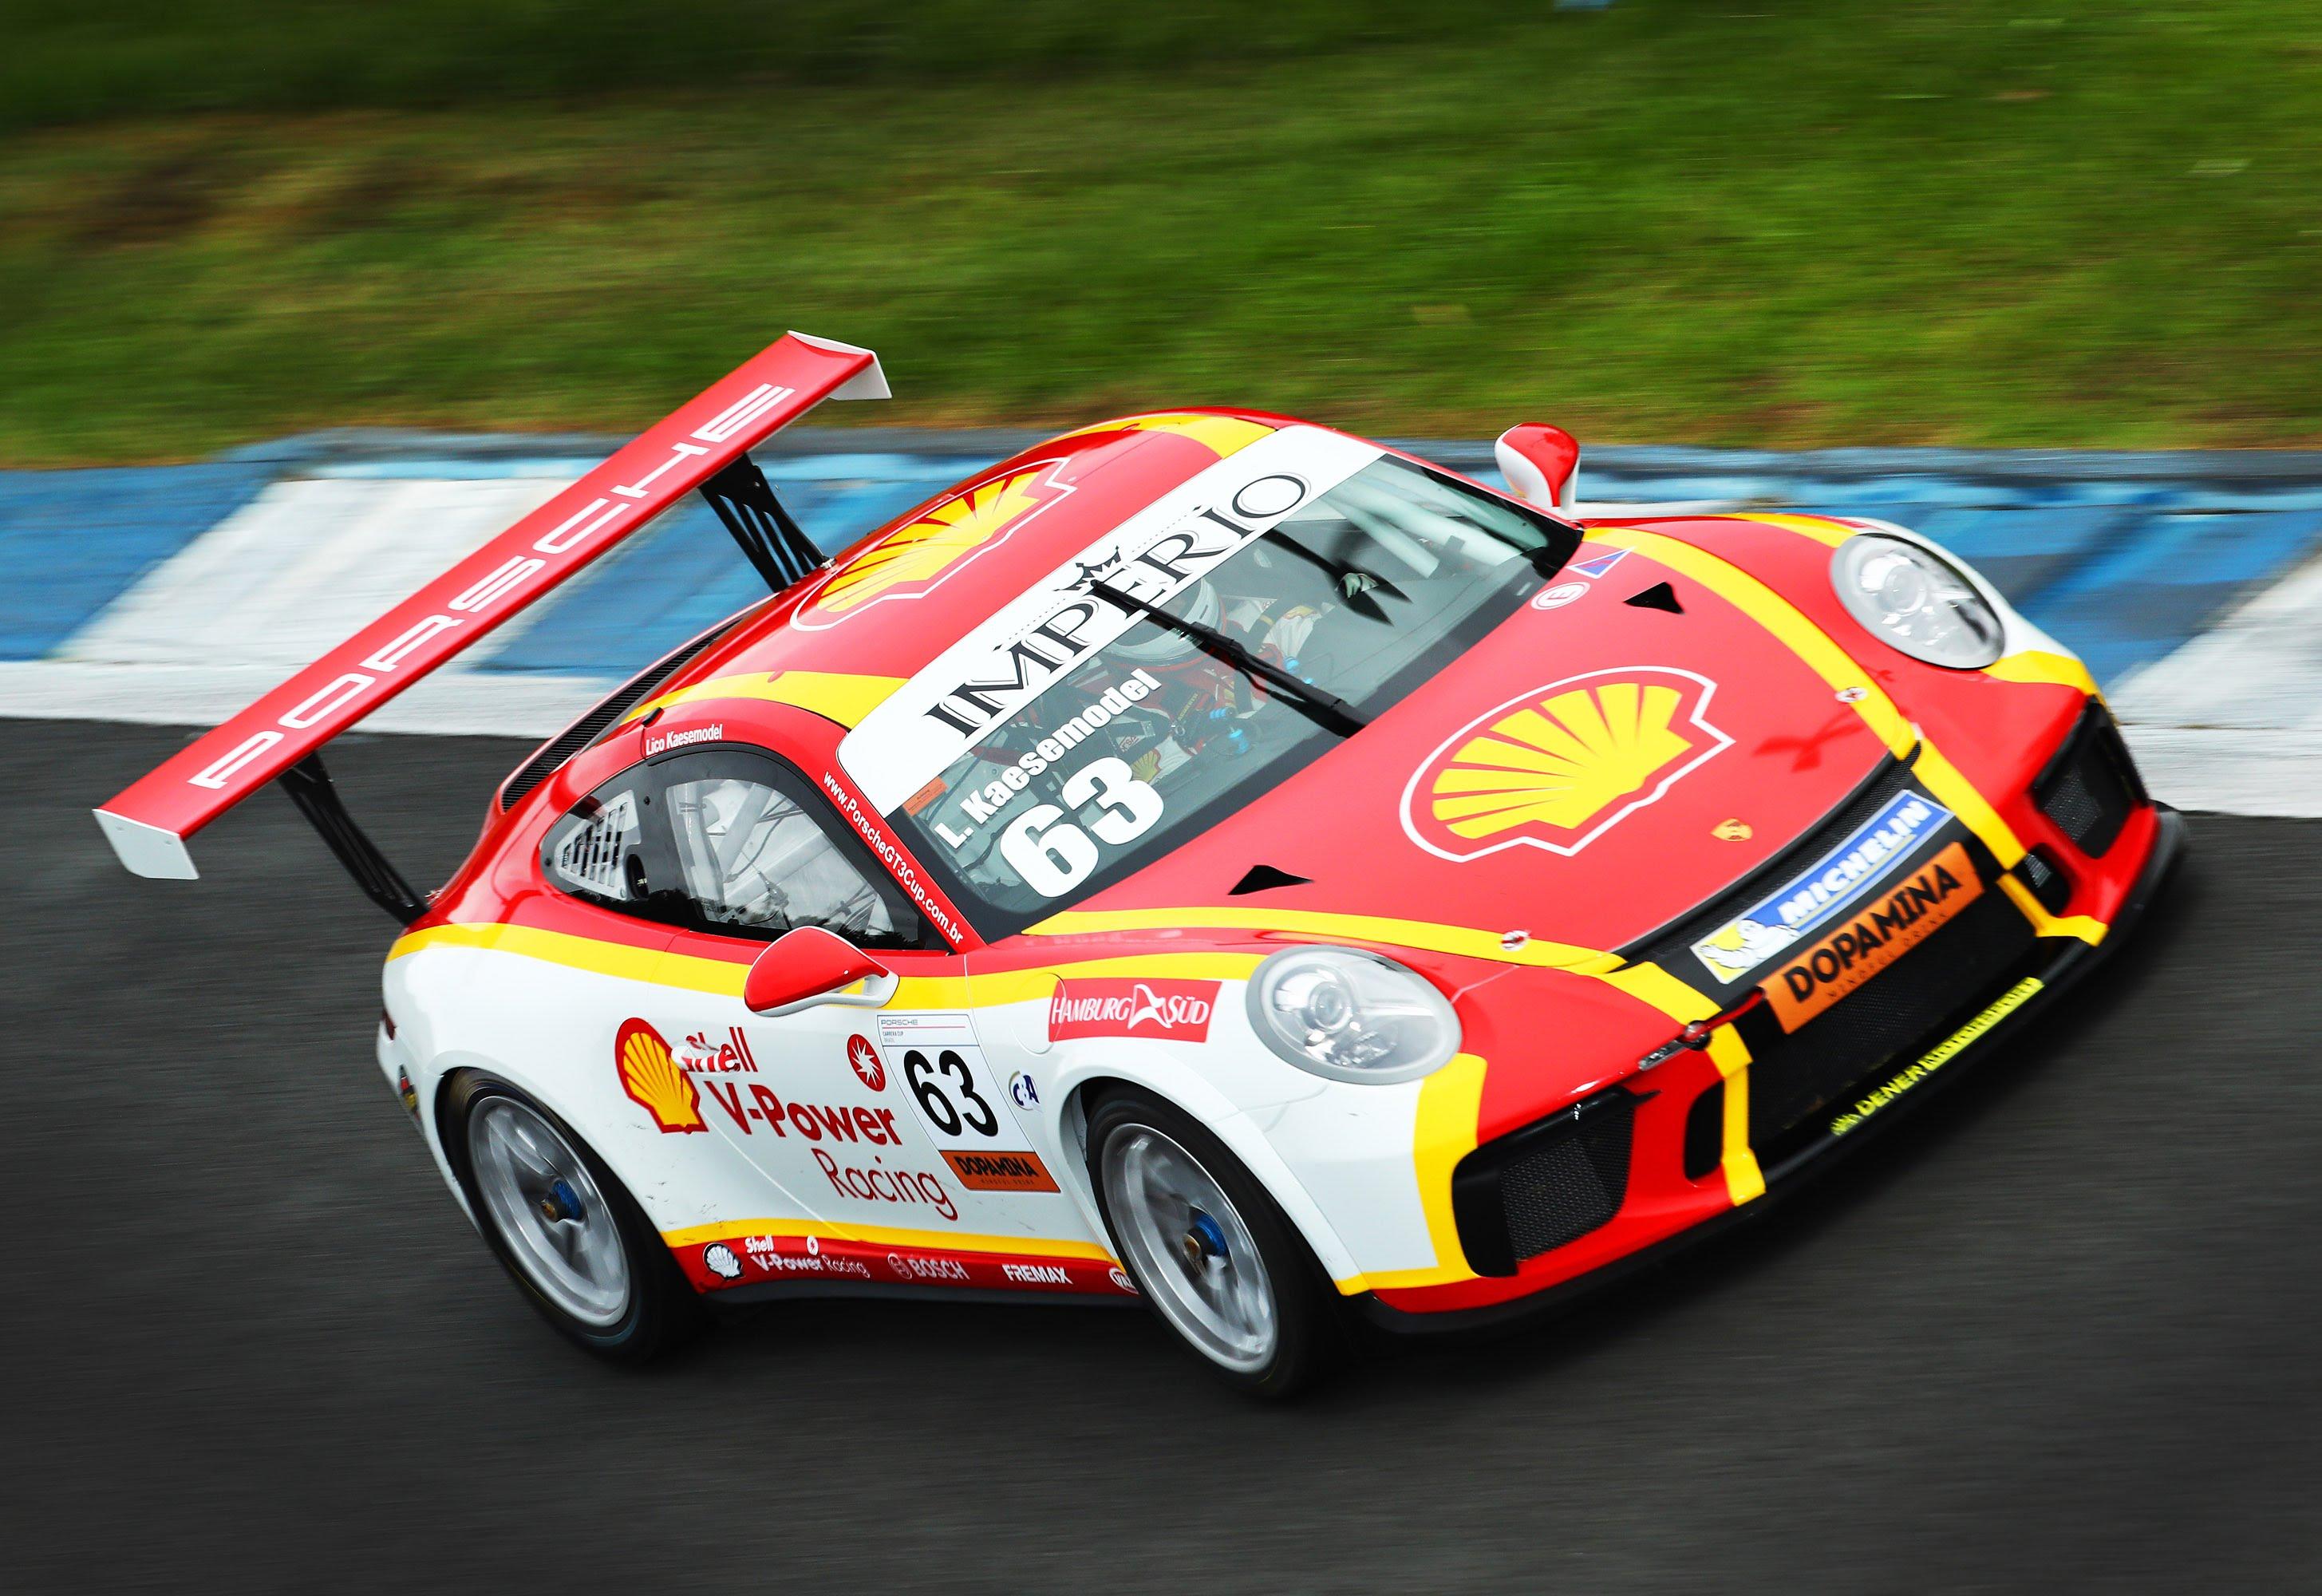 Photo of Porsche Cup – Werner Neugebauer e Lico Kaesemodel levam as cores da Shell na Porsche Carrera Cup em 2020